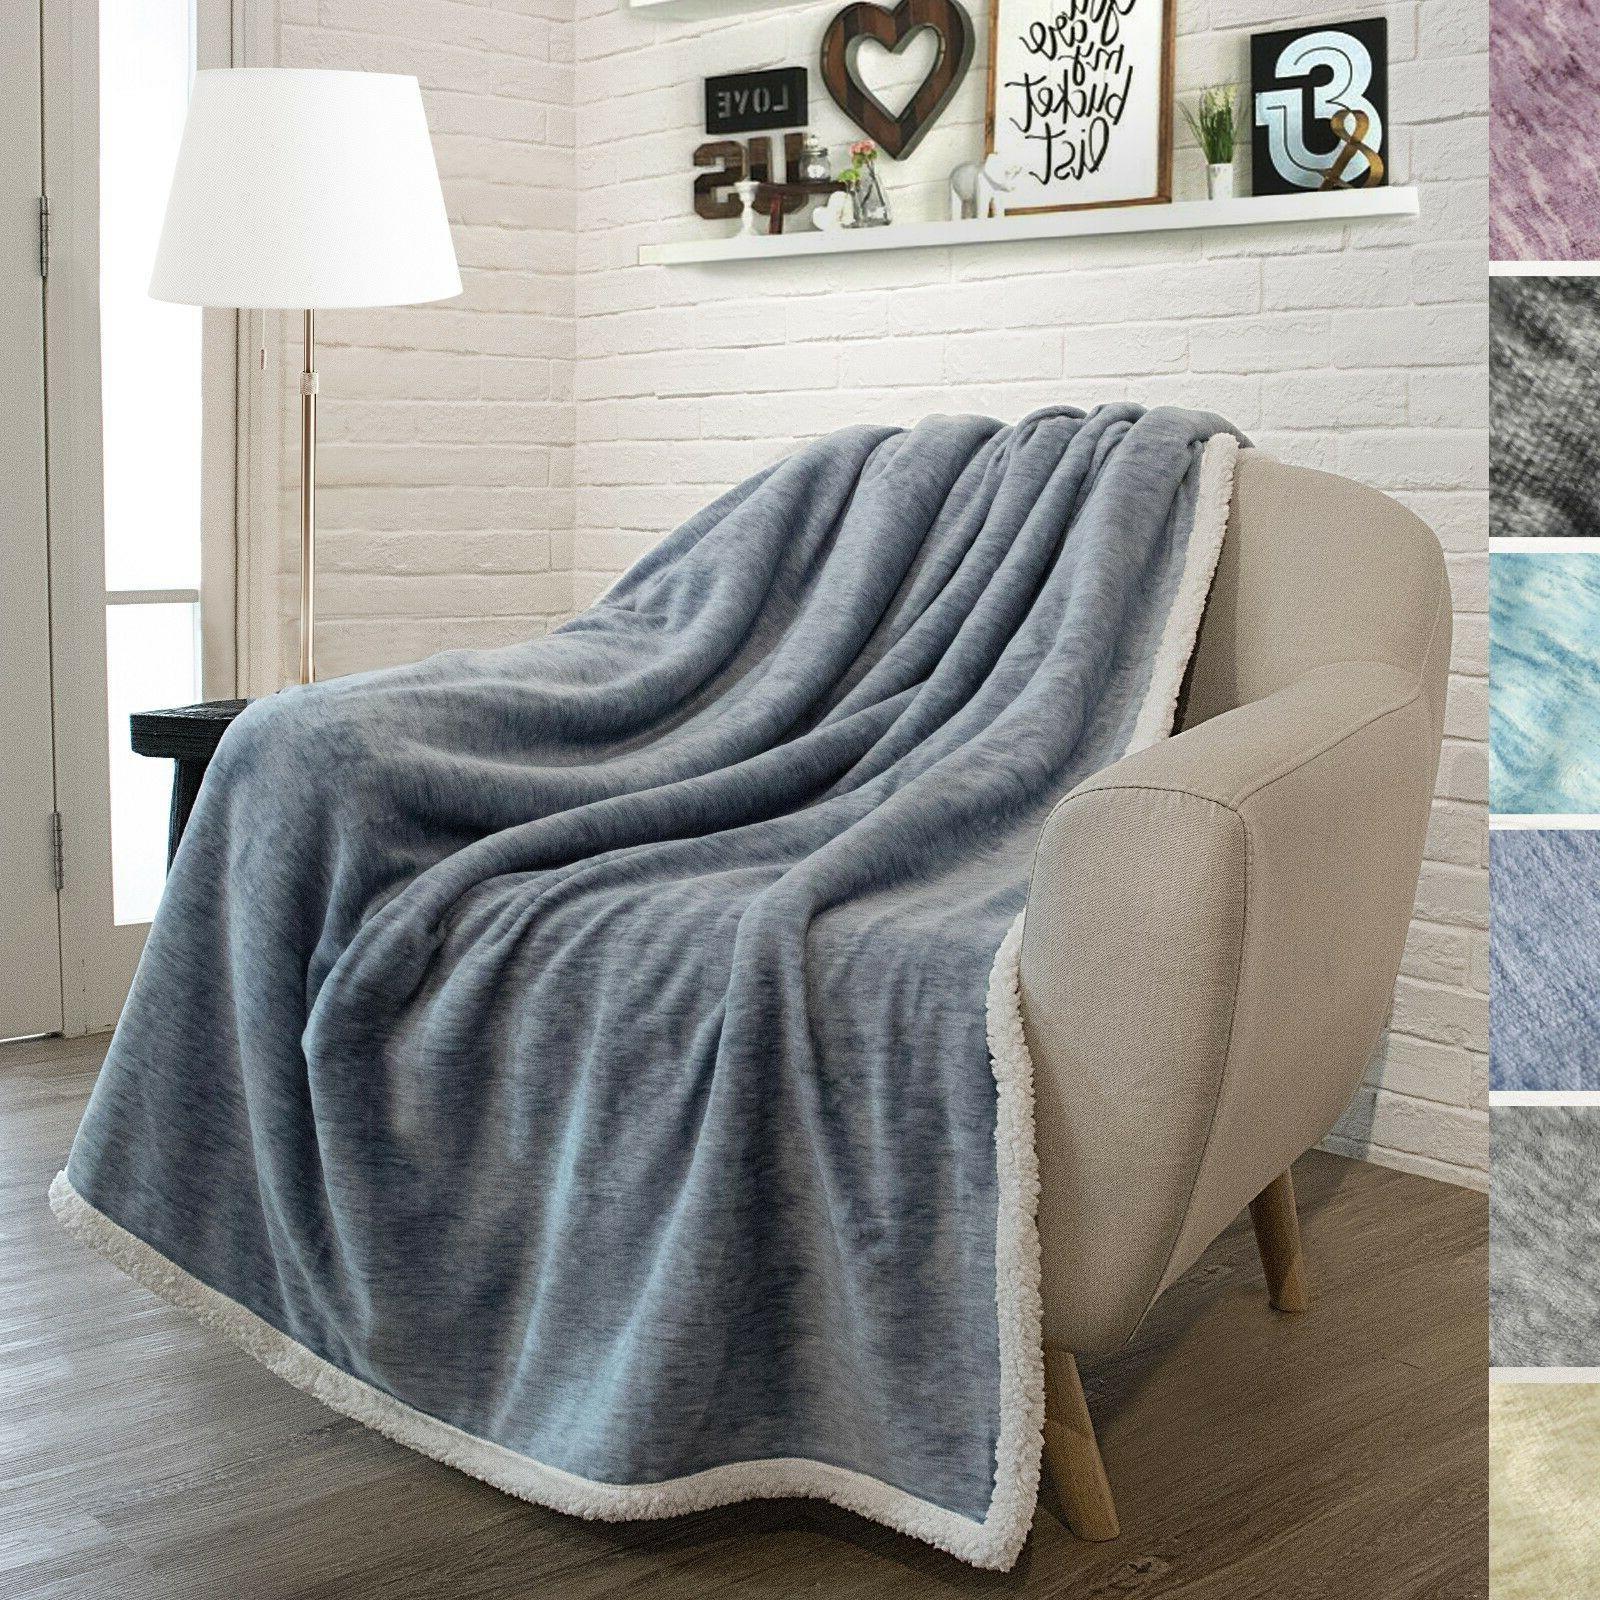 Sherpa Couch Sofa Reversible Soft Microfiber Fleece